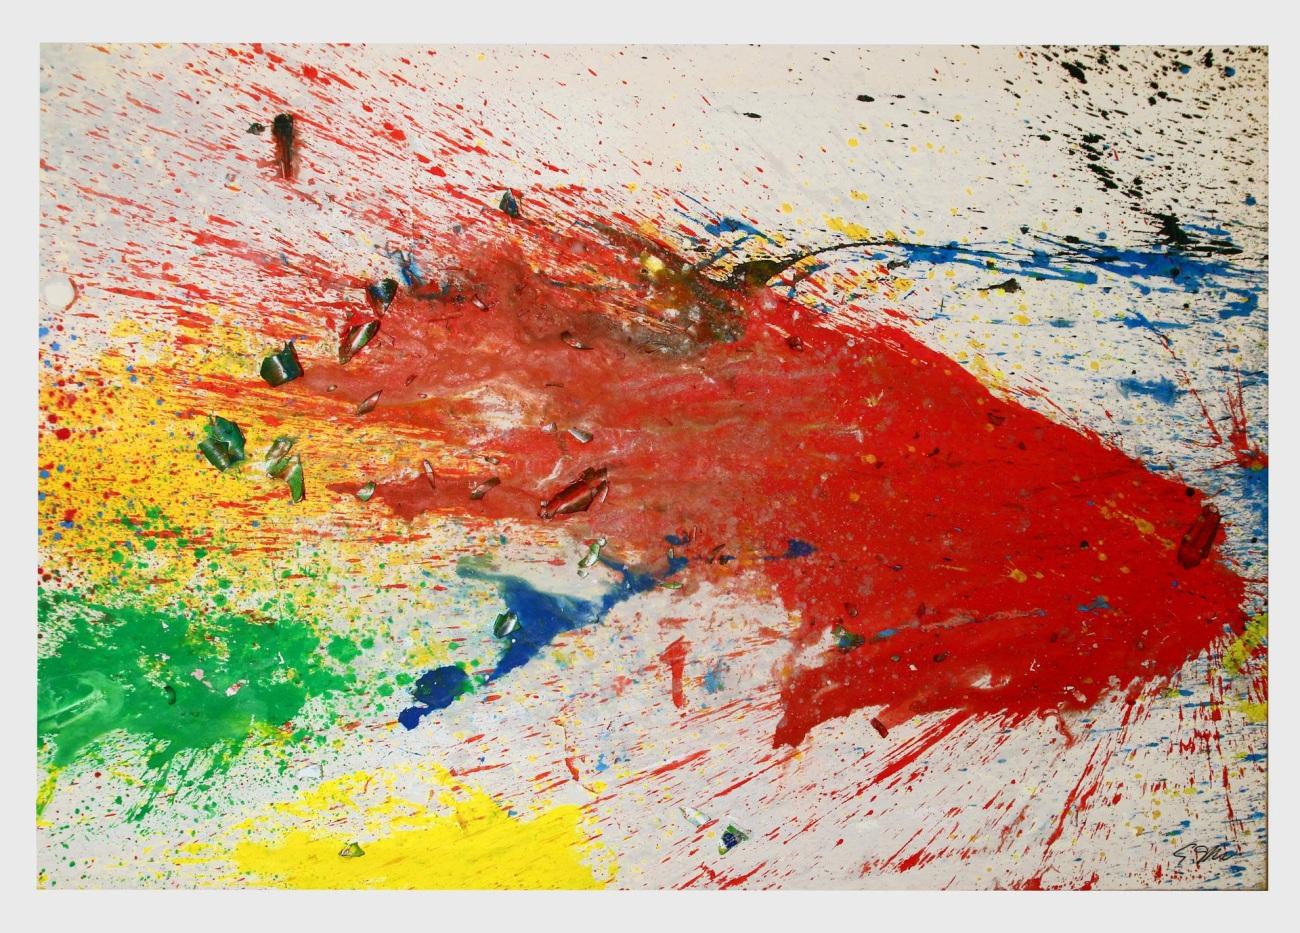 Shozo Shimamoto, Capri - Certosa 13 (2008), acrylic on light canvas, 185 x 274 cm. Courtesy Cardi Gallery